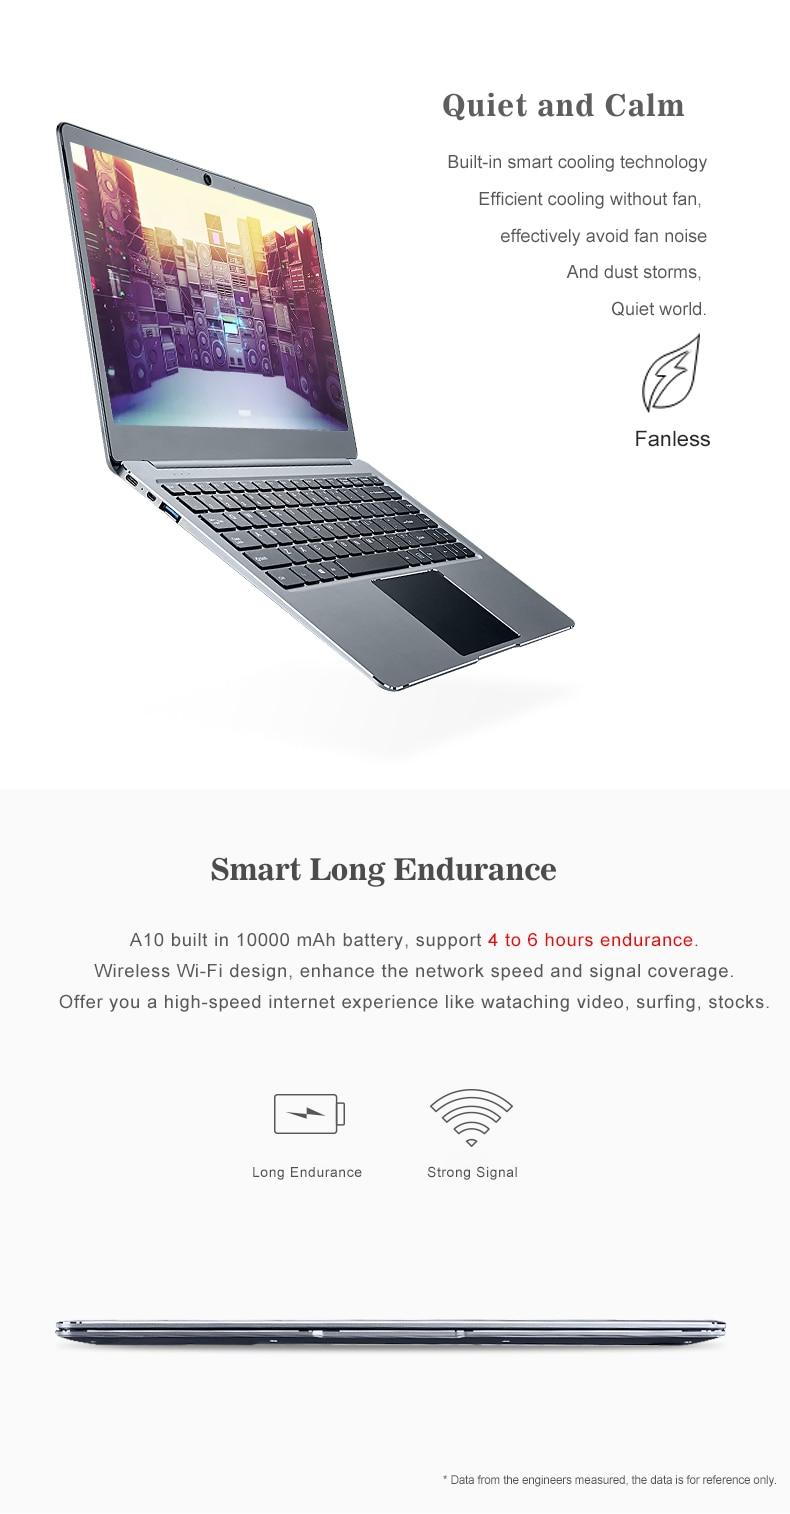 ZEUSLAP 14inch 6gb ram 64gb emmc 128gb ssd Intel quad core windows 10 system ultrathin 1920X1080p fhd laptop notebook computer